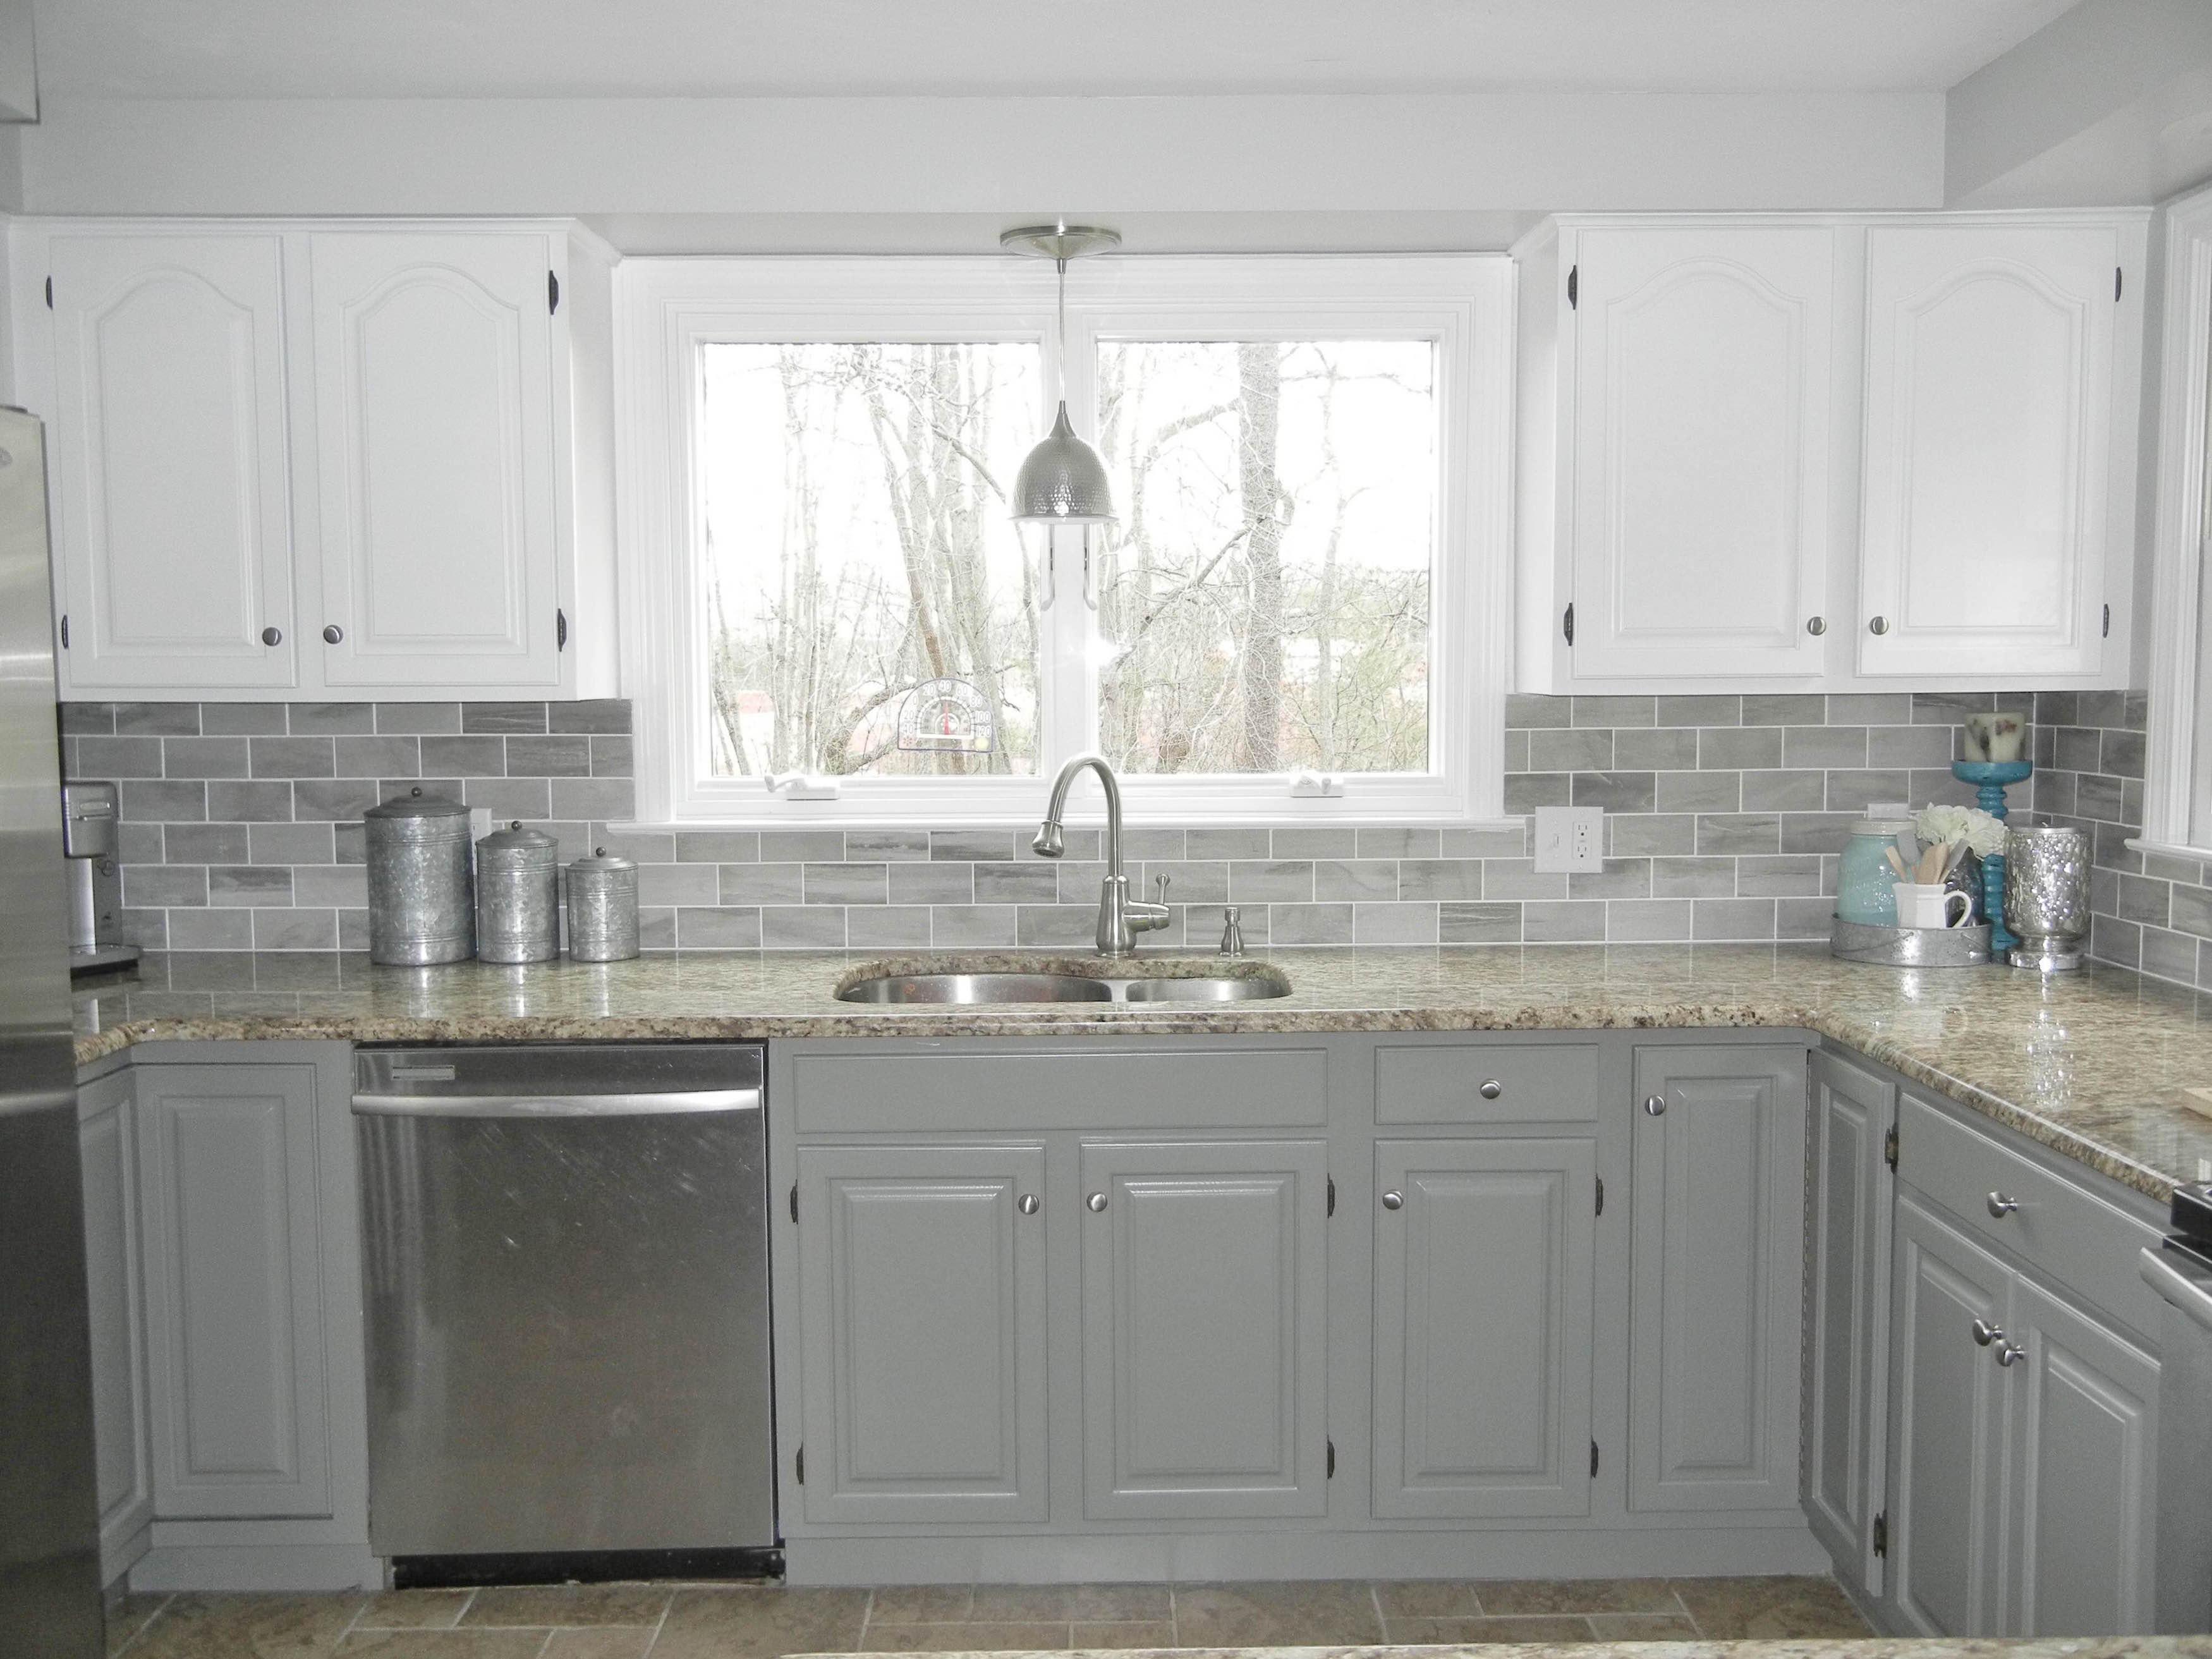 painted kitchen cabinet ideas white photo - 5